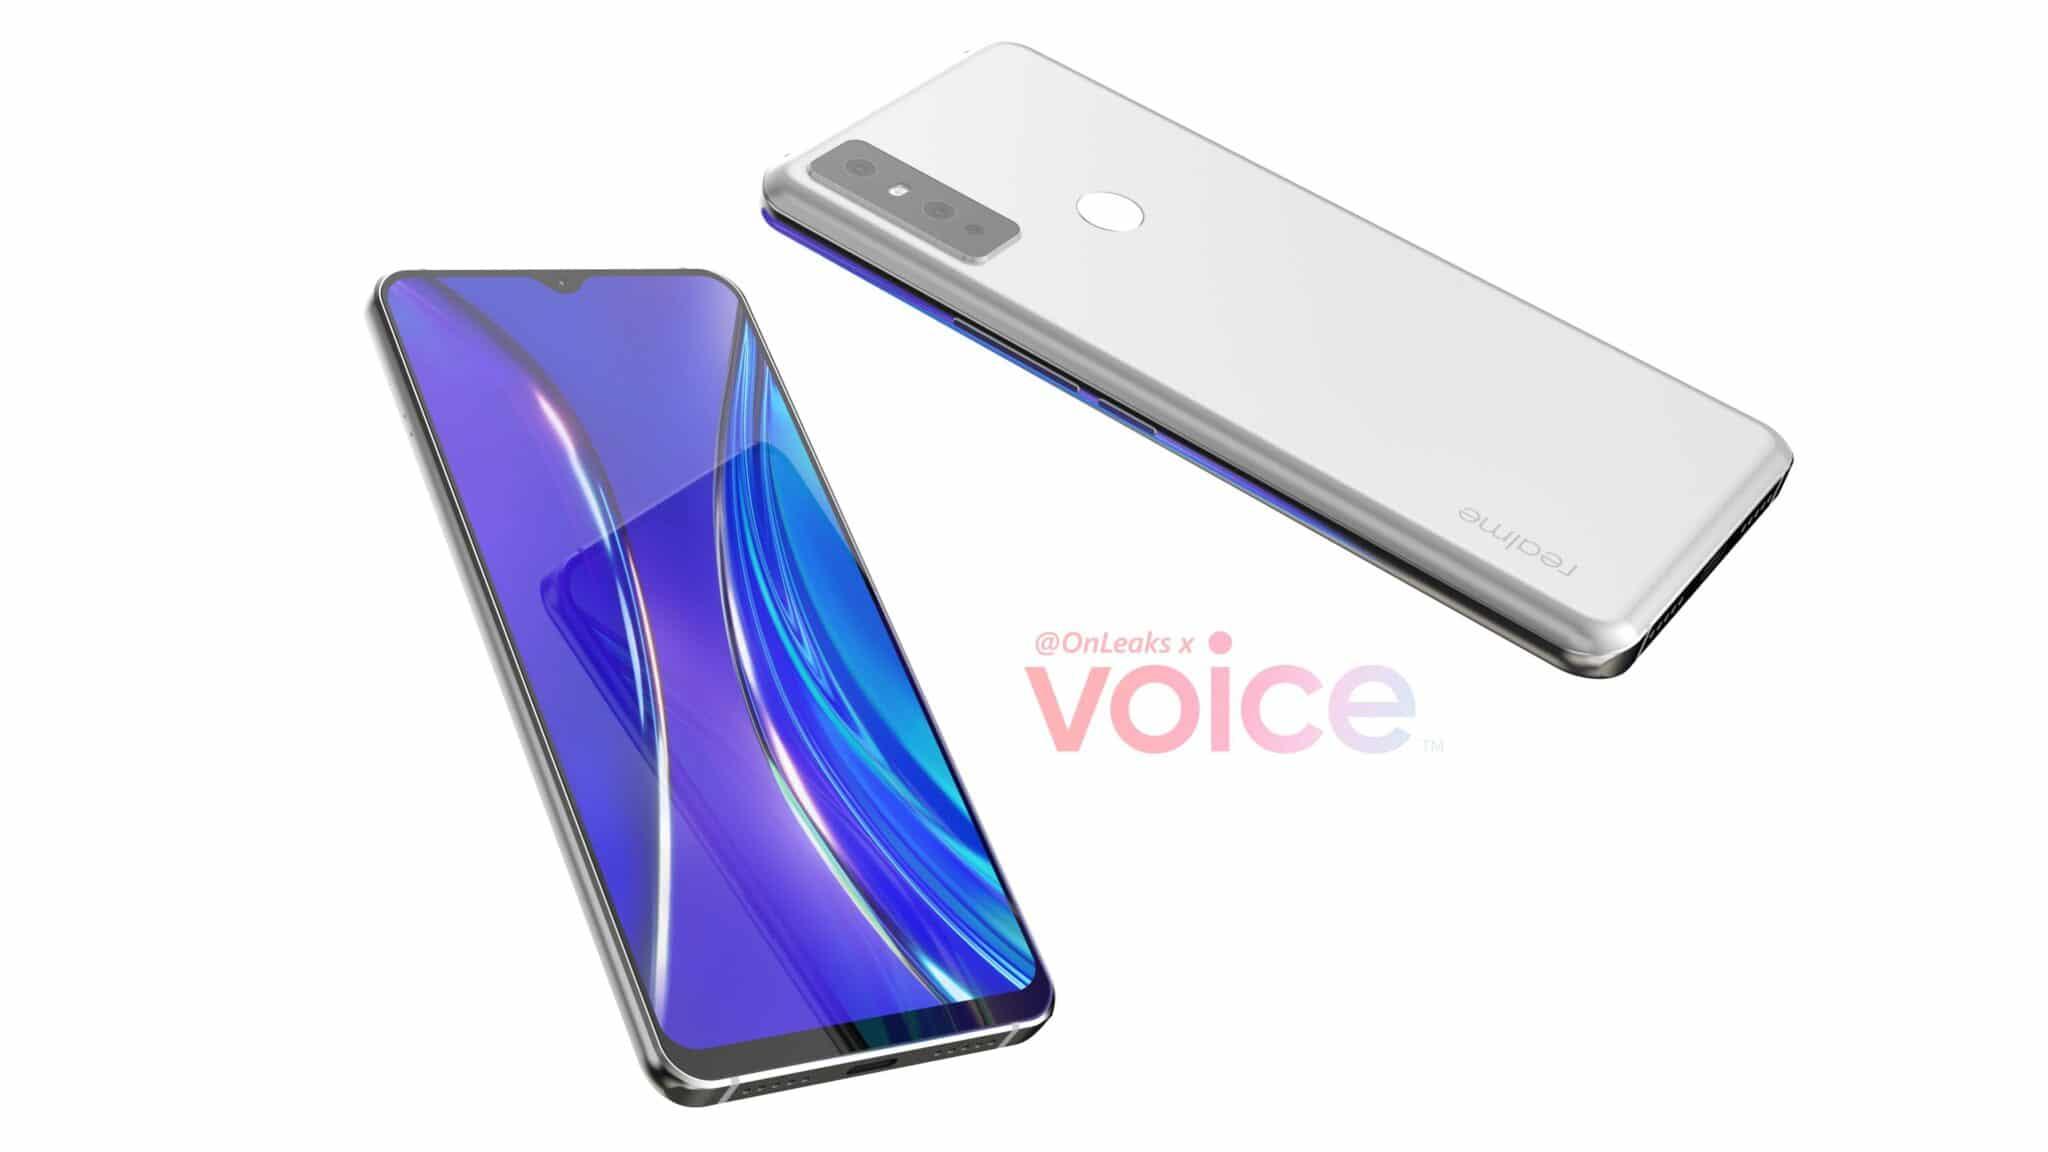 superior-render-3D-smartphone-Realme-marzo-2021